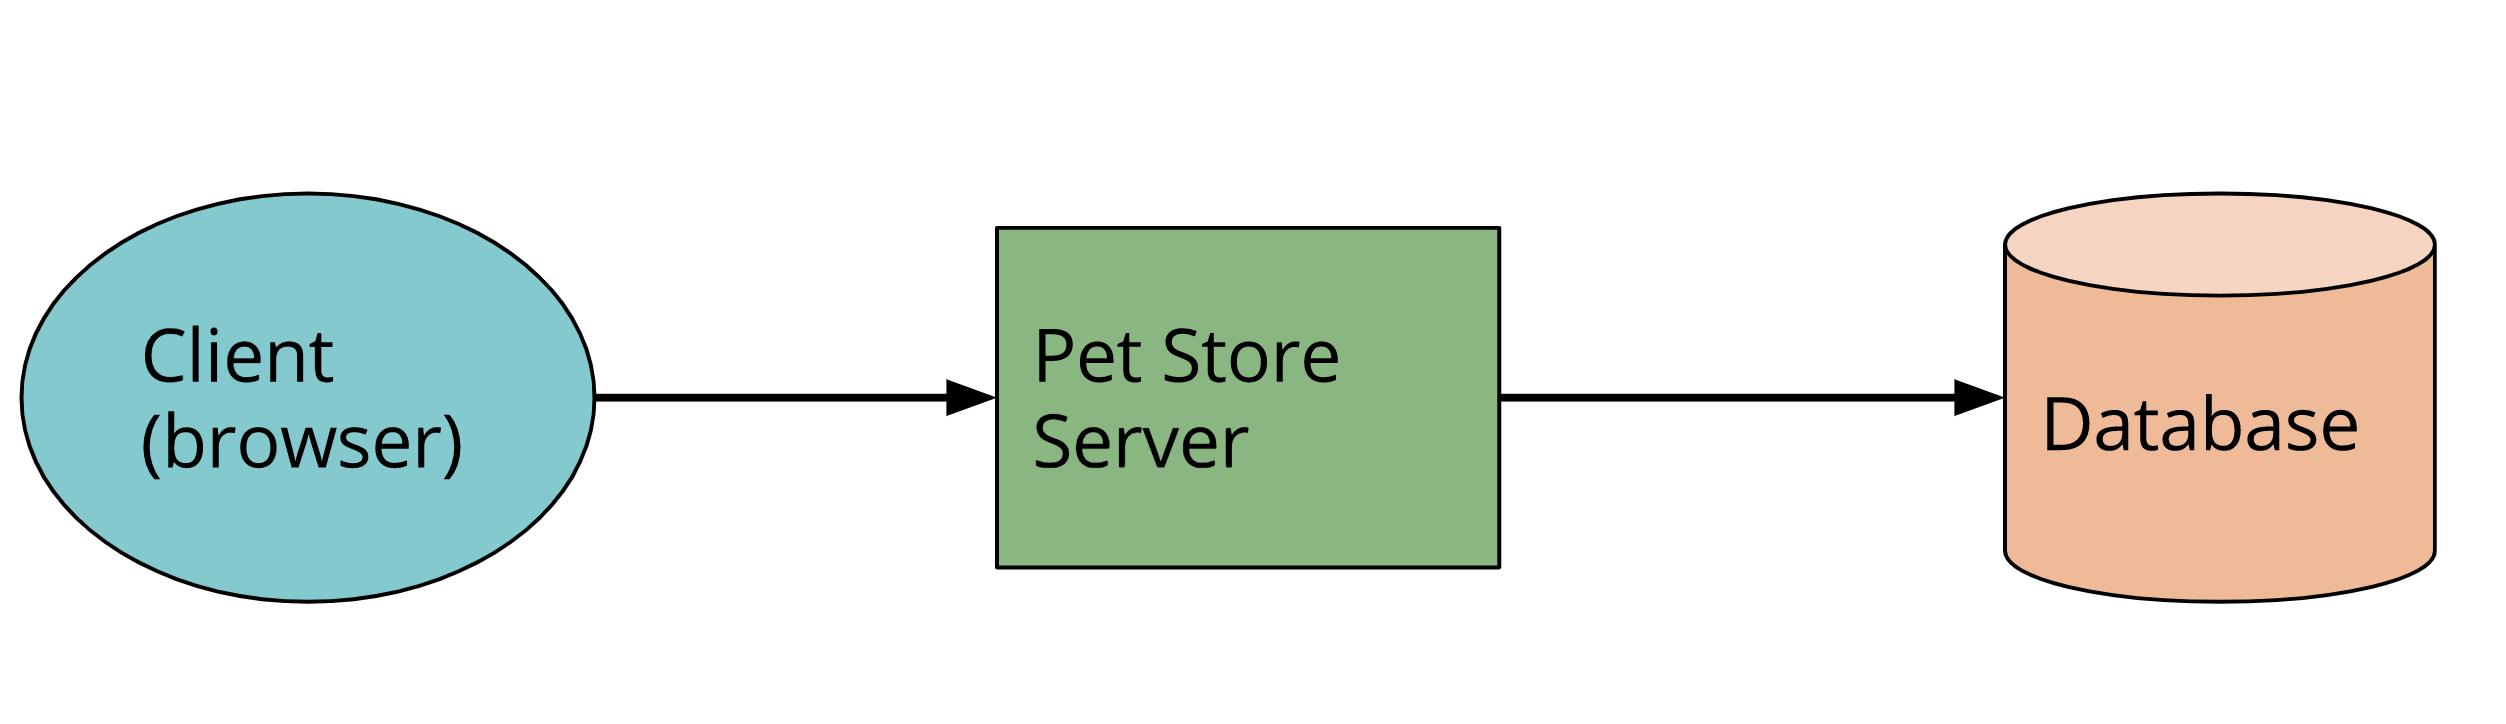 serverless无服务器架构系列一